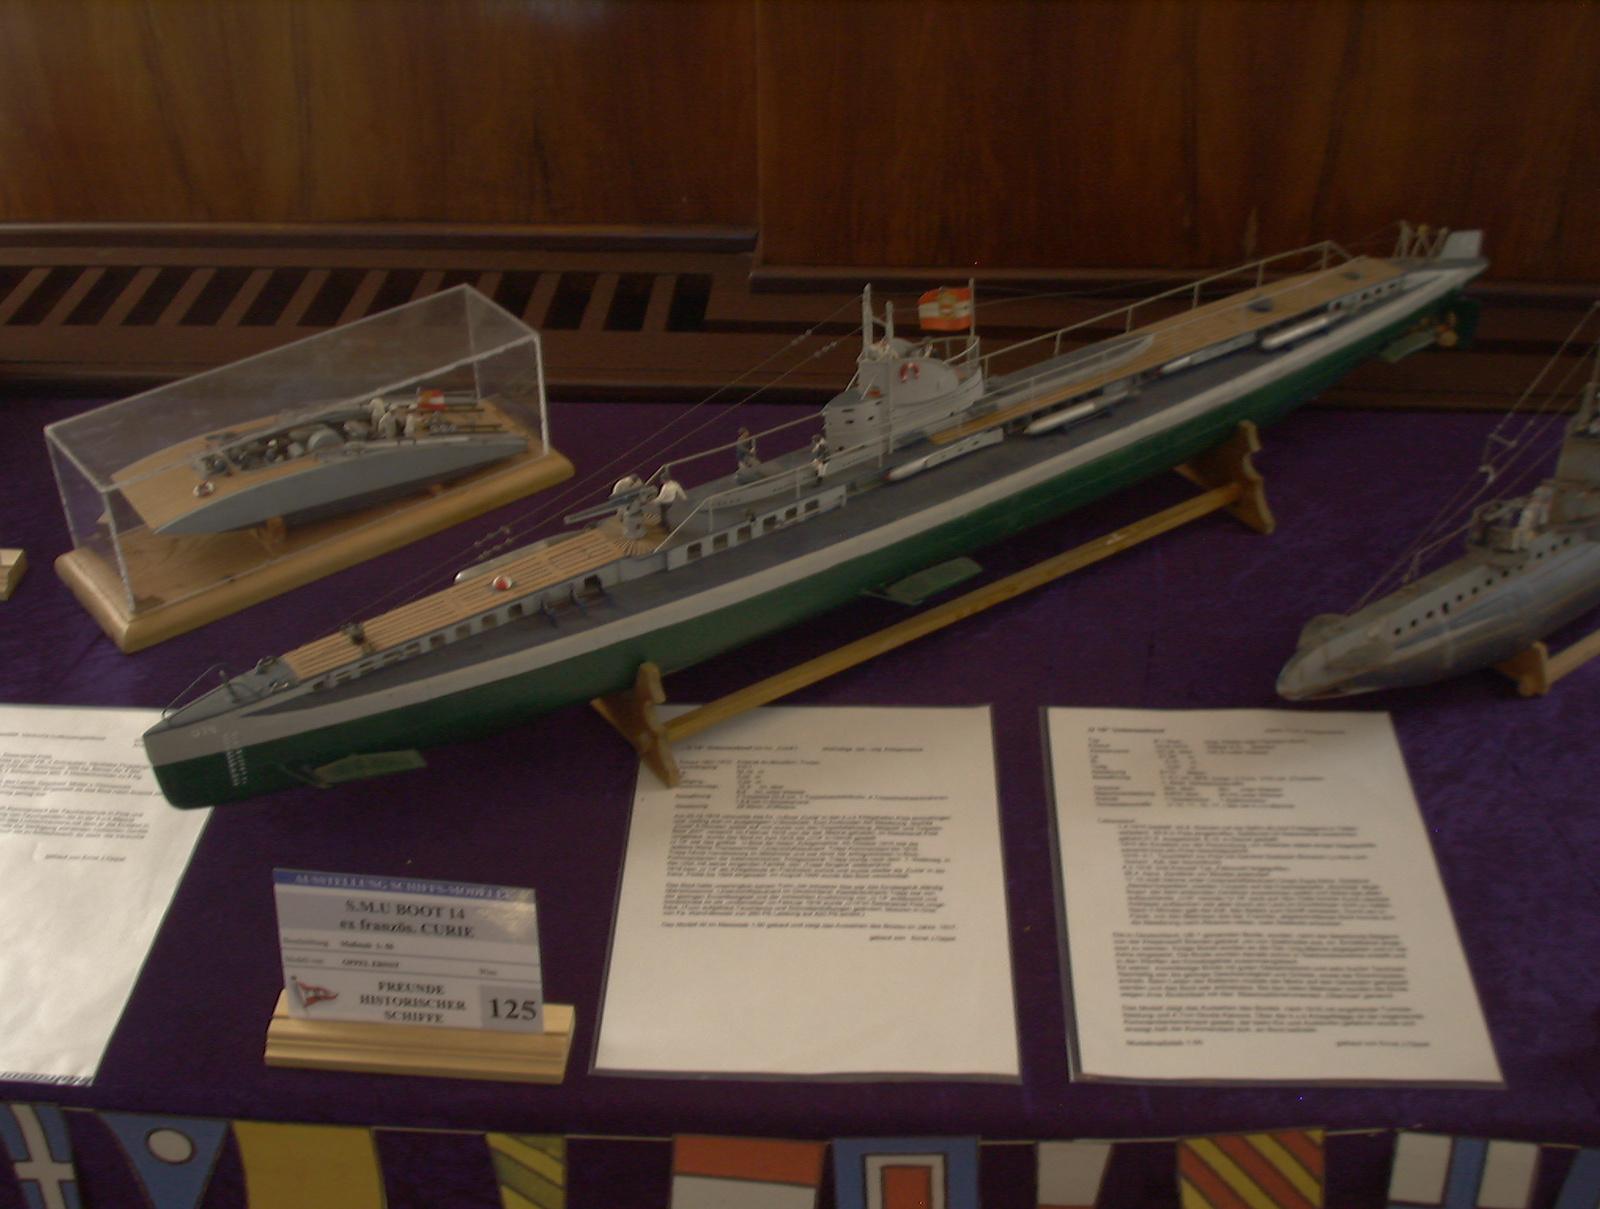 U14 (ex-Curie) tengeralattjáró M=1:200